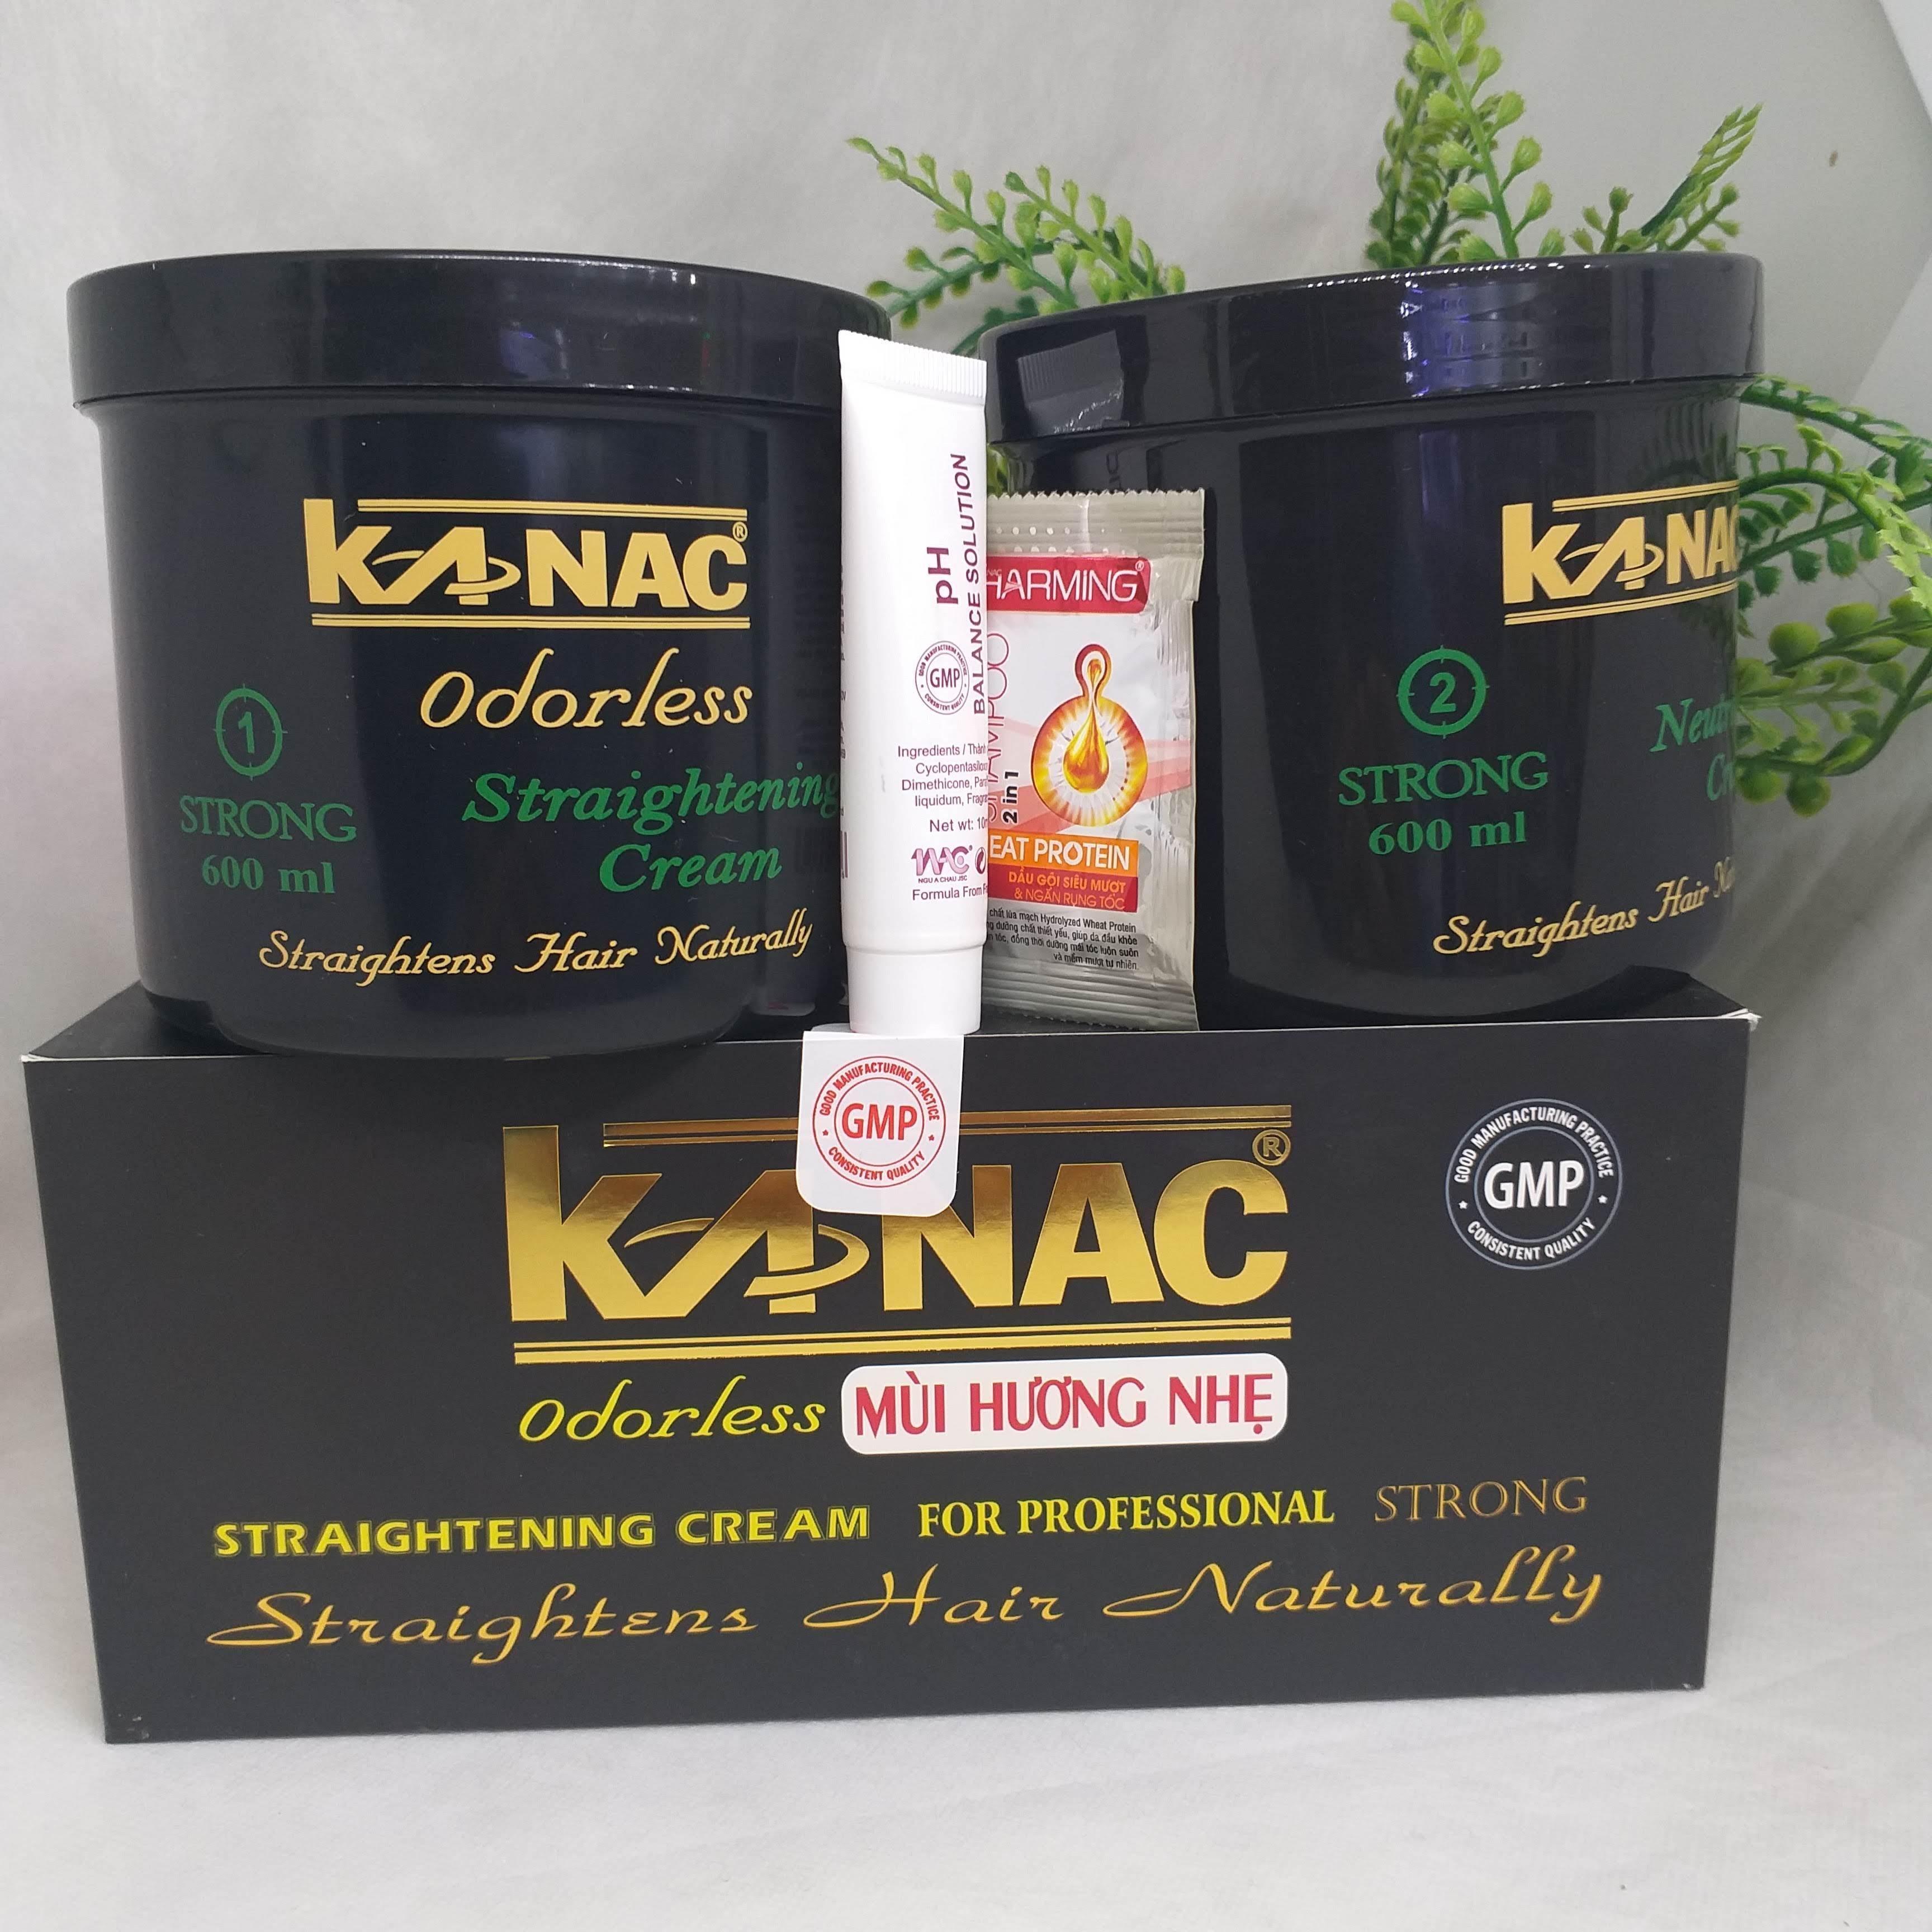 Kem duỗi tóc Kanac đen hộp 600ml x 2 giá rẻ